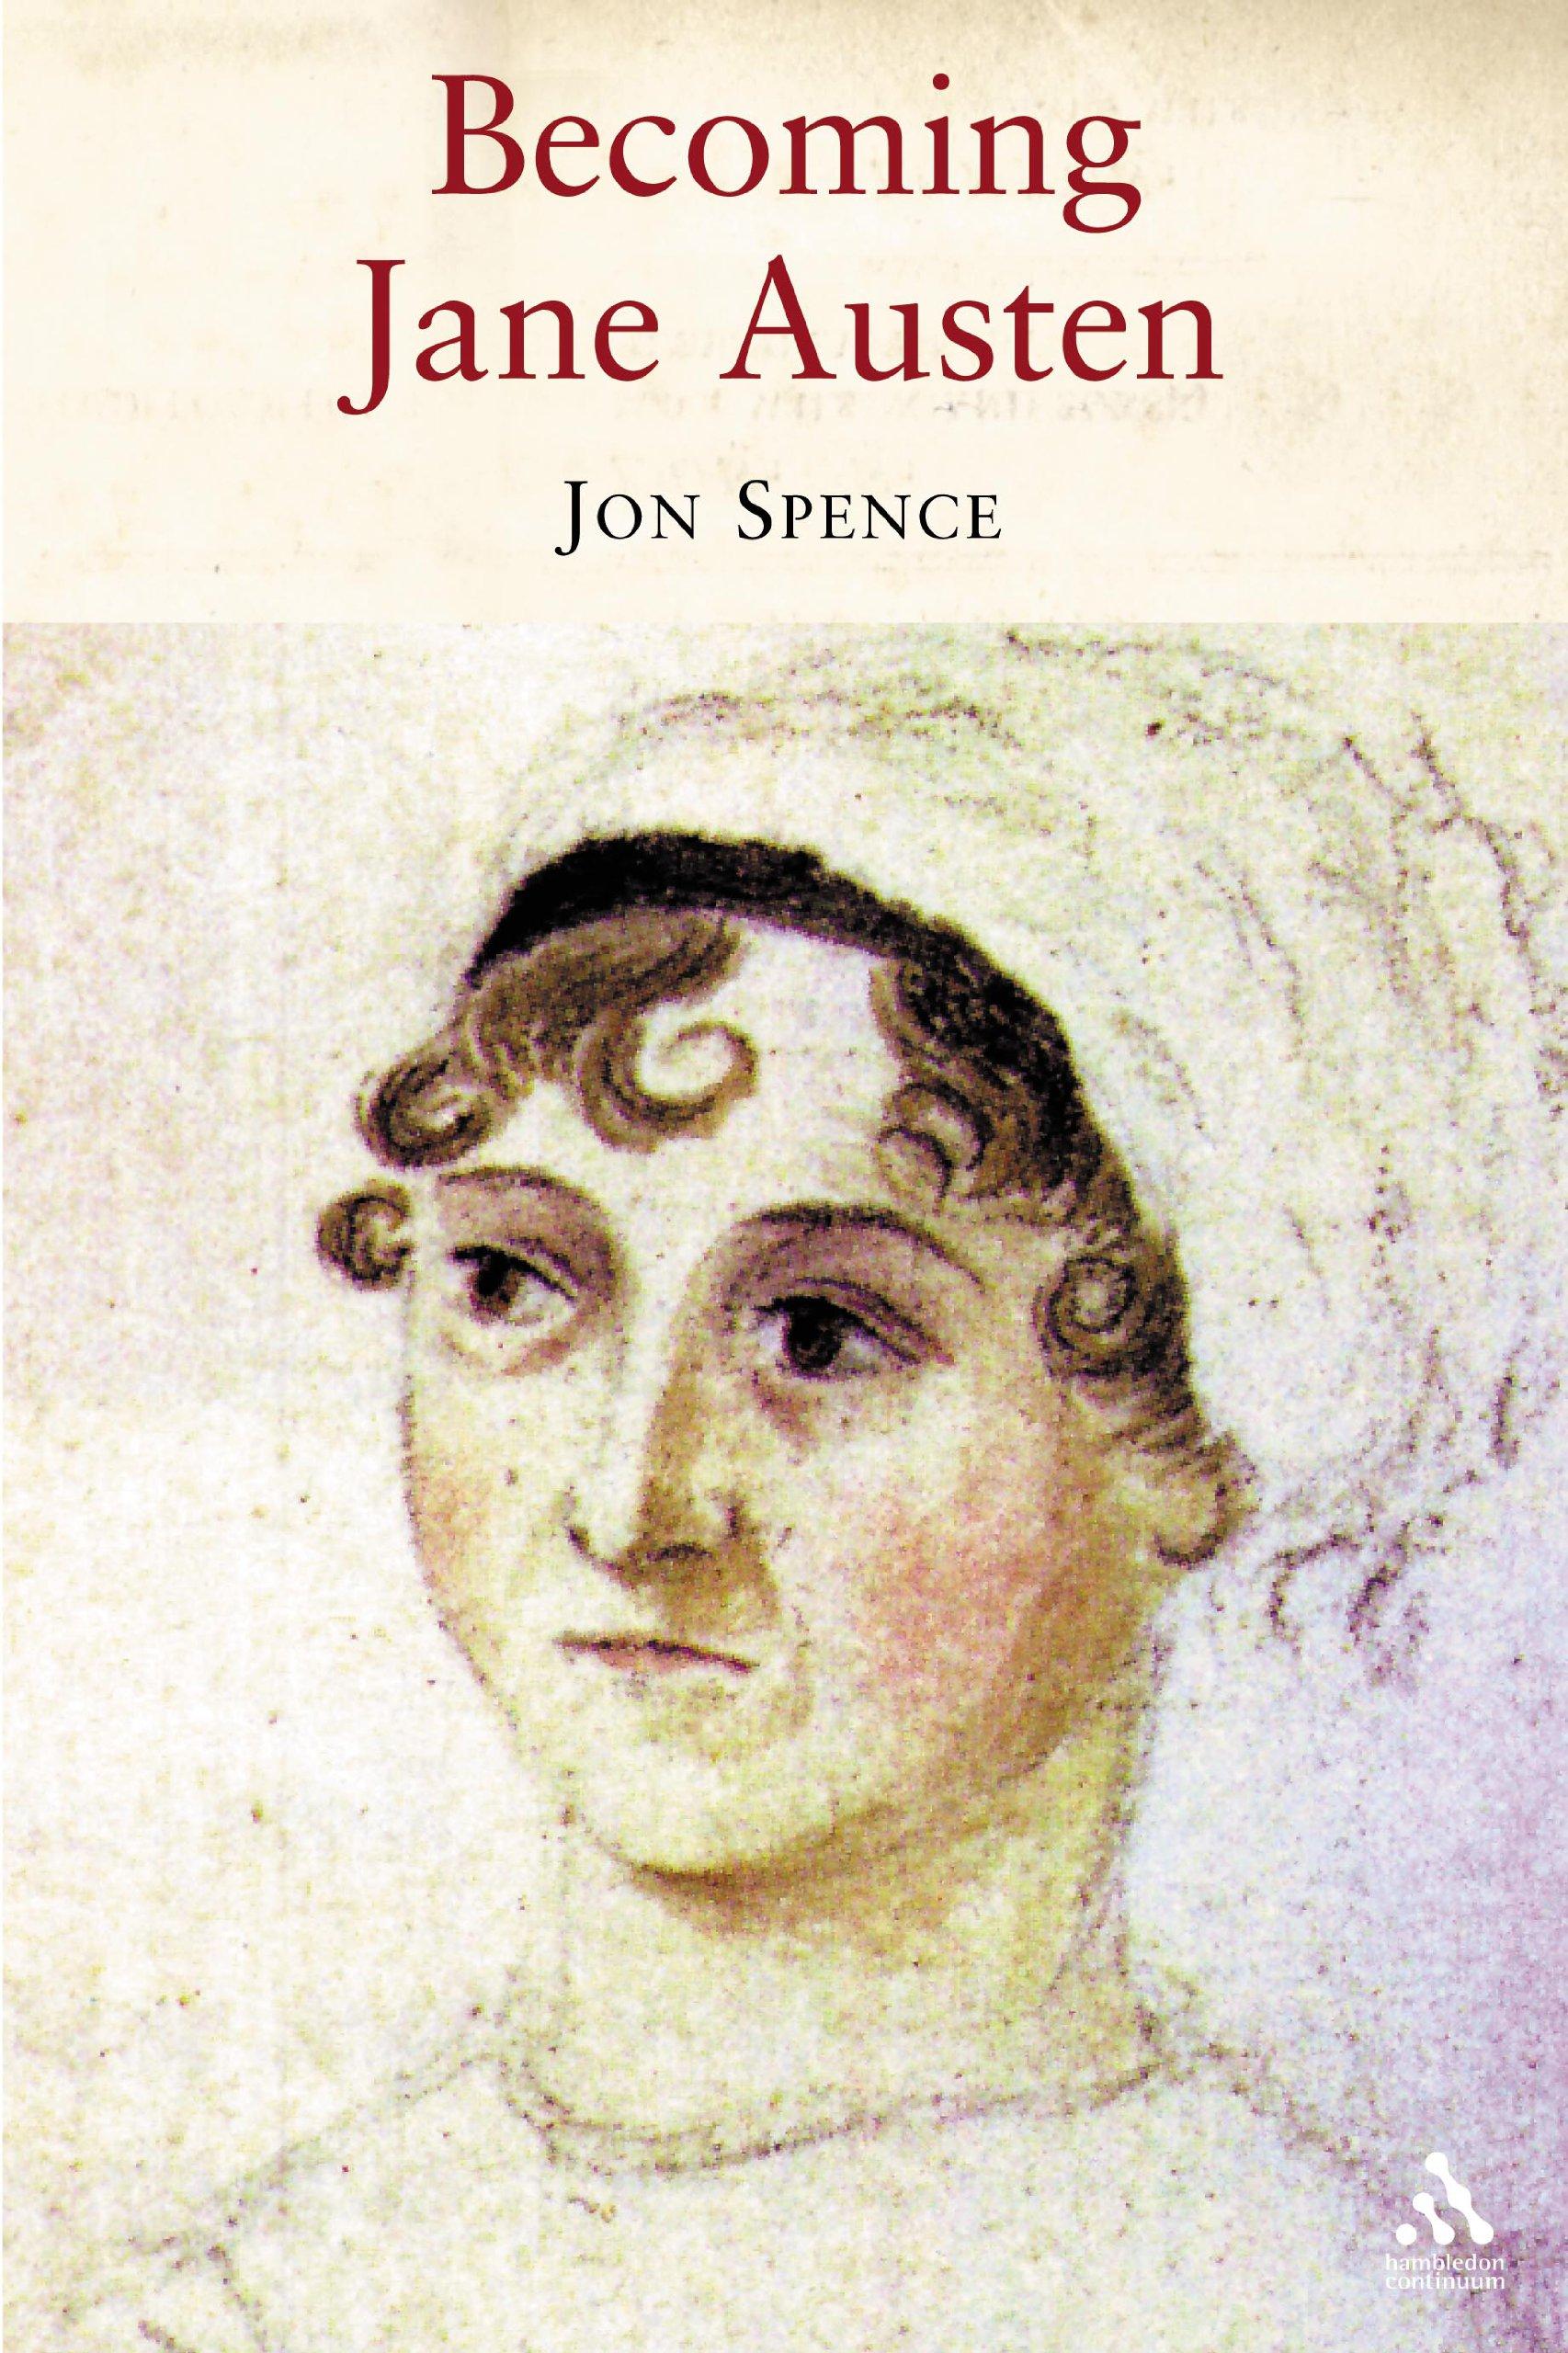 Becoming Jane Austen: A Life: Jon Spence: 9781852855611 ...